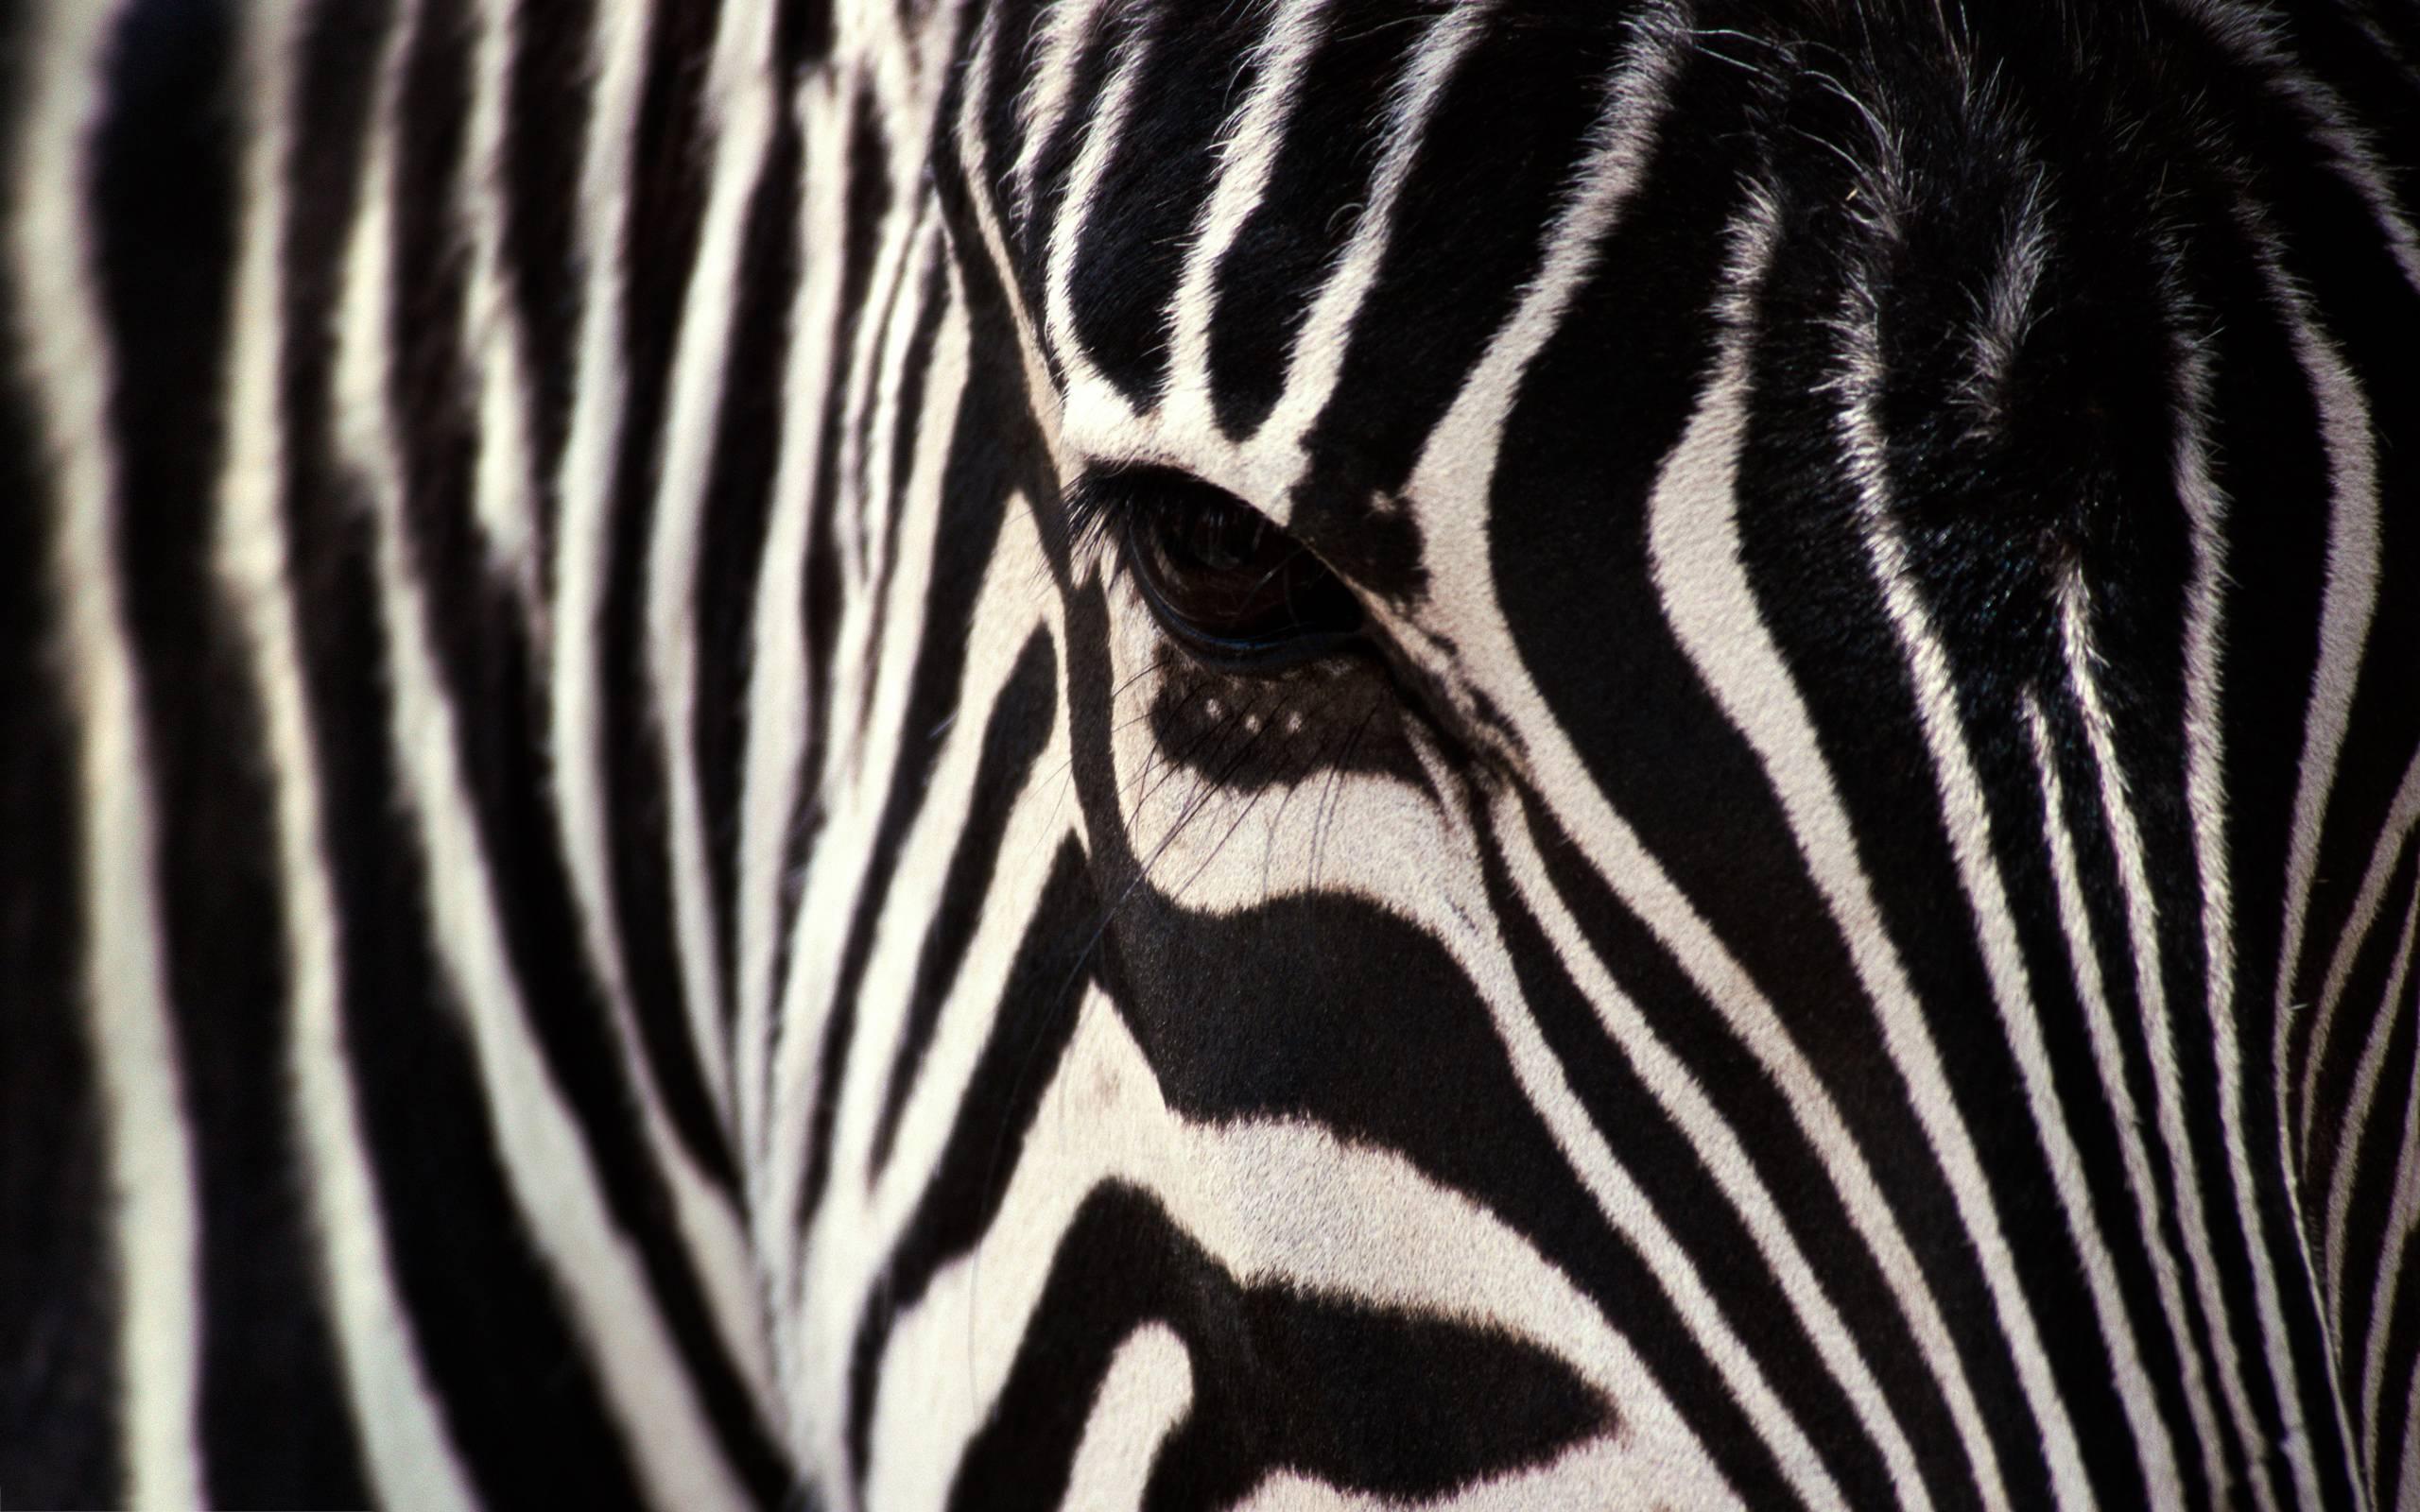 Zebra Backgrounds - Wa...